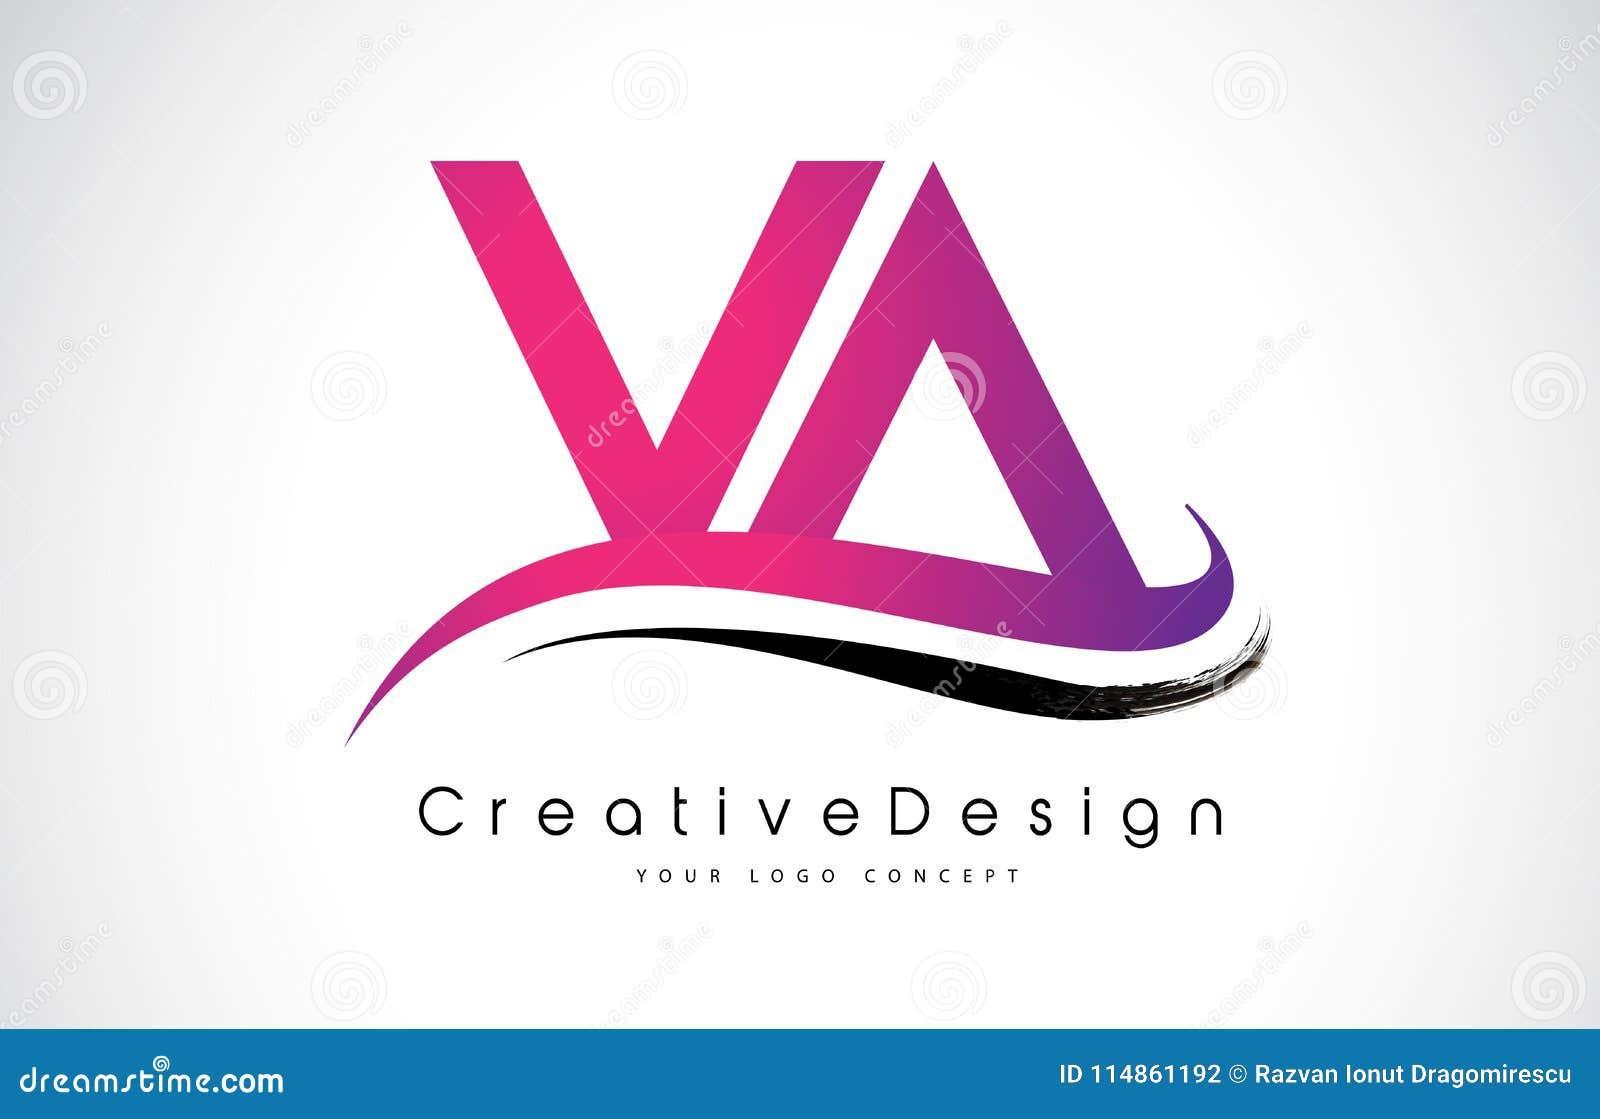 VA V A Letter Logo Design. Creative Icon Modern Letters Vector L ...